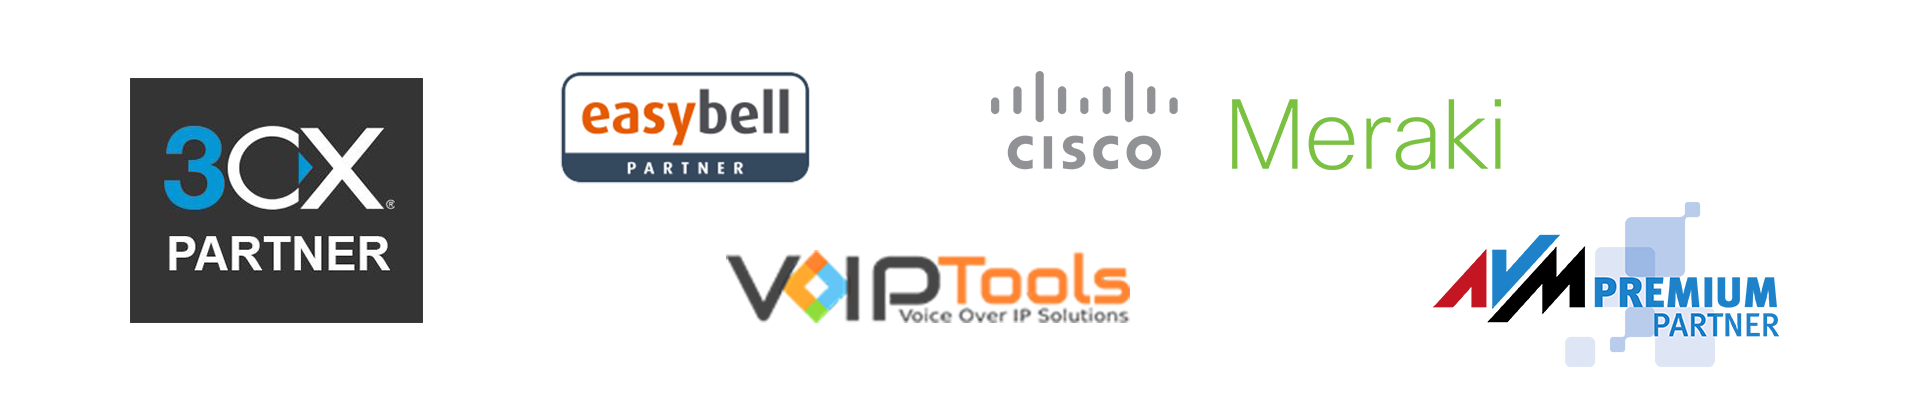 Junge Software Kaiserslautern Partnerlogos - 3CX, EasyBell, Cisco Meraki, VoIP Tools, AVM